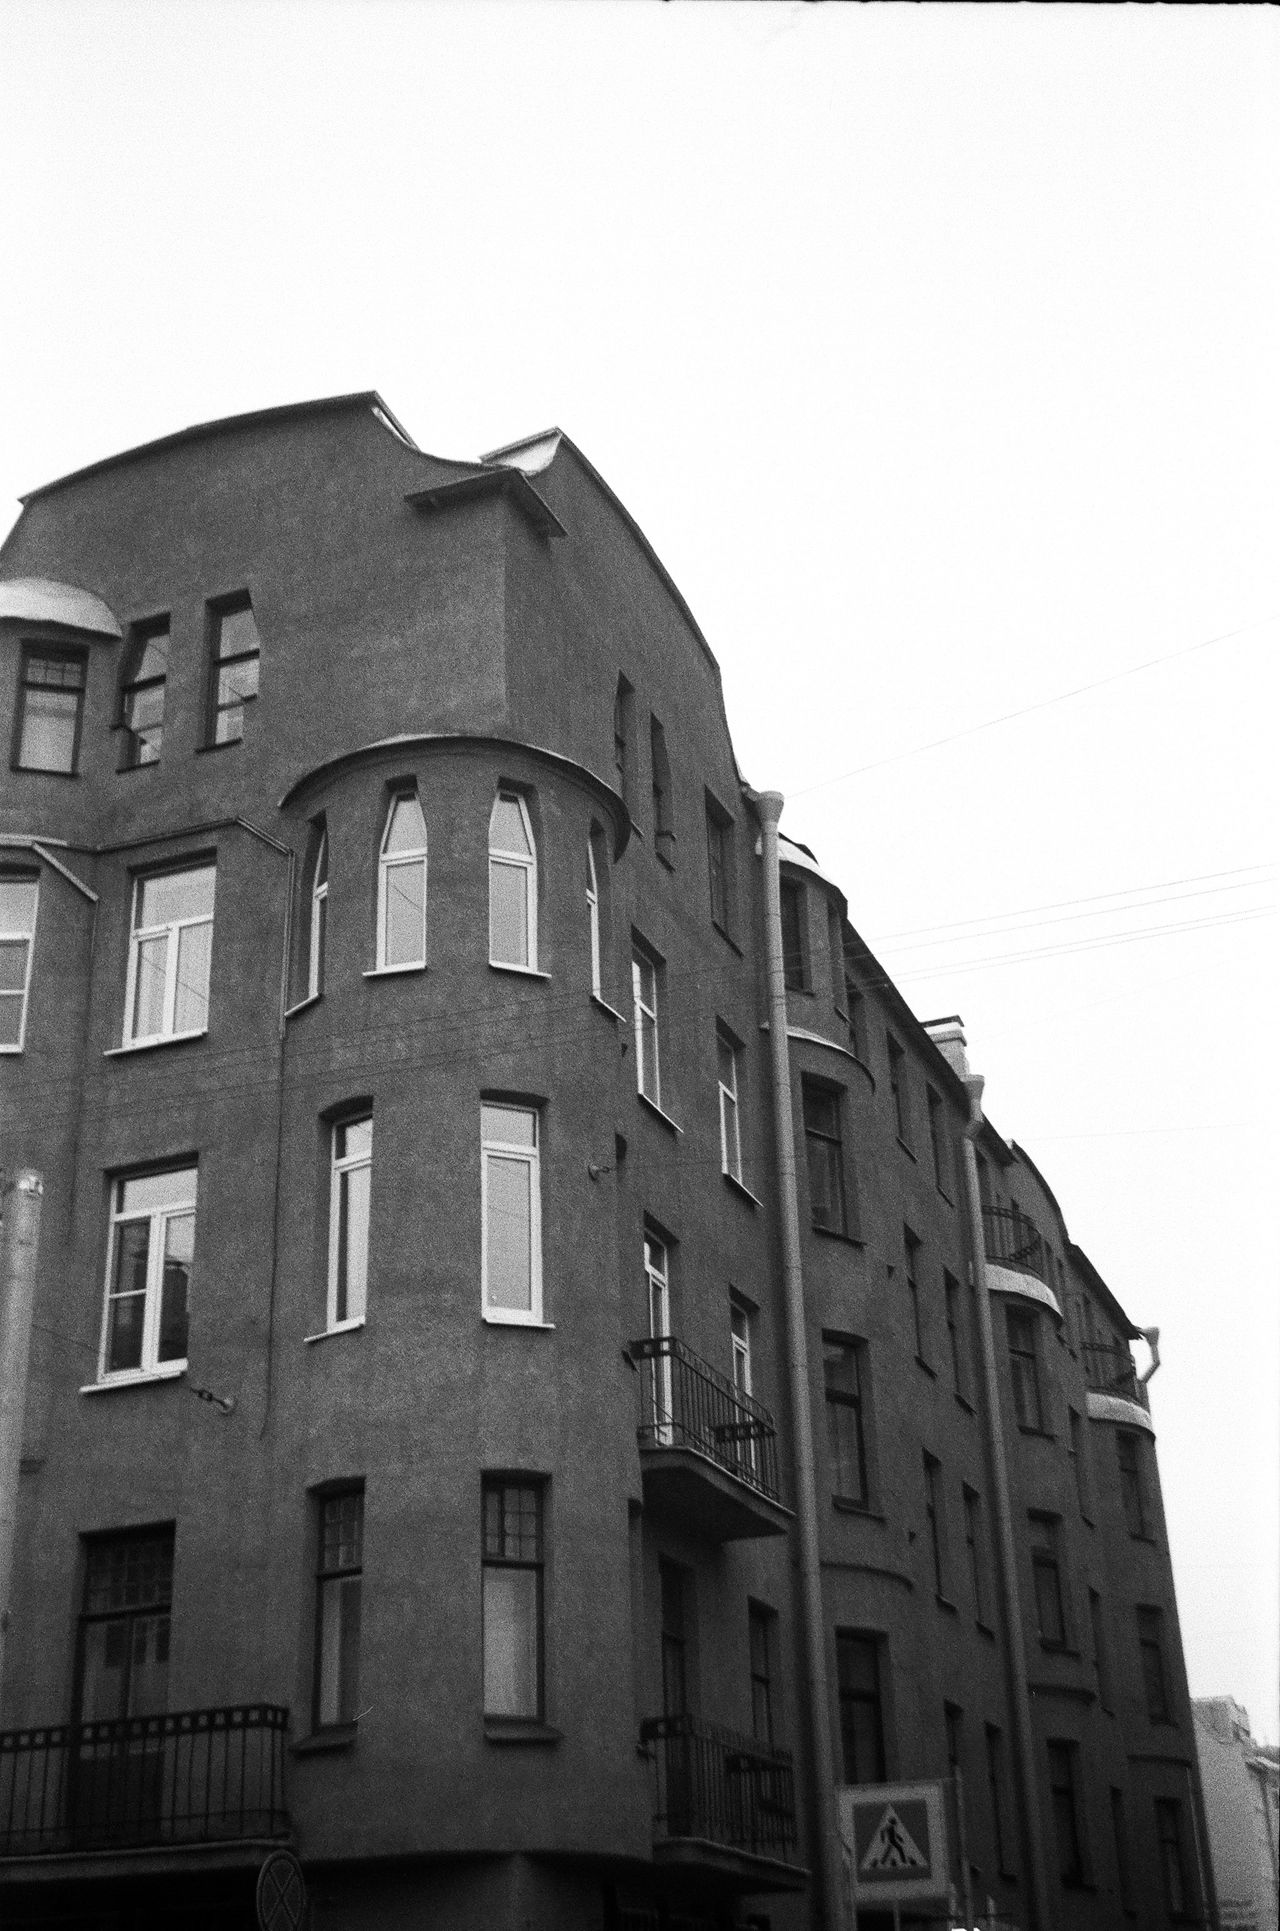 Architecture Building Exterior Built Structure Window Apartment Façade Exterior Tower Branches Streets Monochrome Photgraphy Saintpetersburg FiftyShadesOfGrey Blackandwhite Monochrome Doublecolors 50shadesofgrey Facades SlideBlack And White Grayscale Bandw Anticolors Fiftyshades Shadow